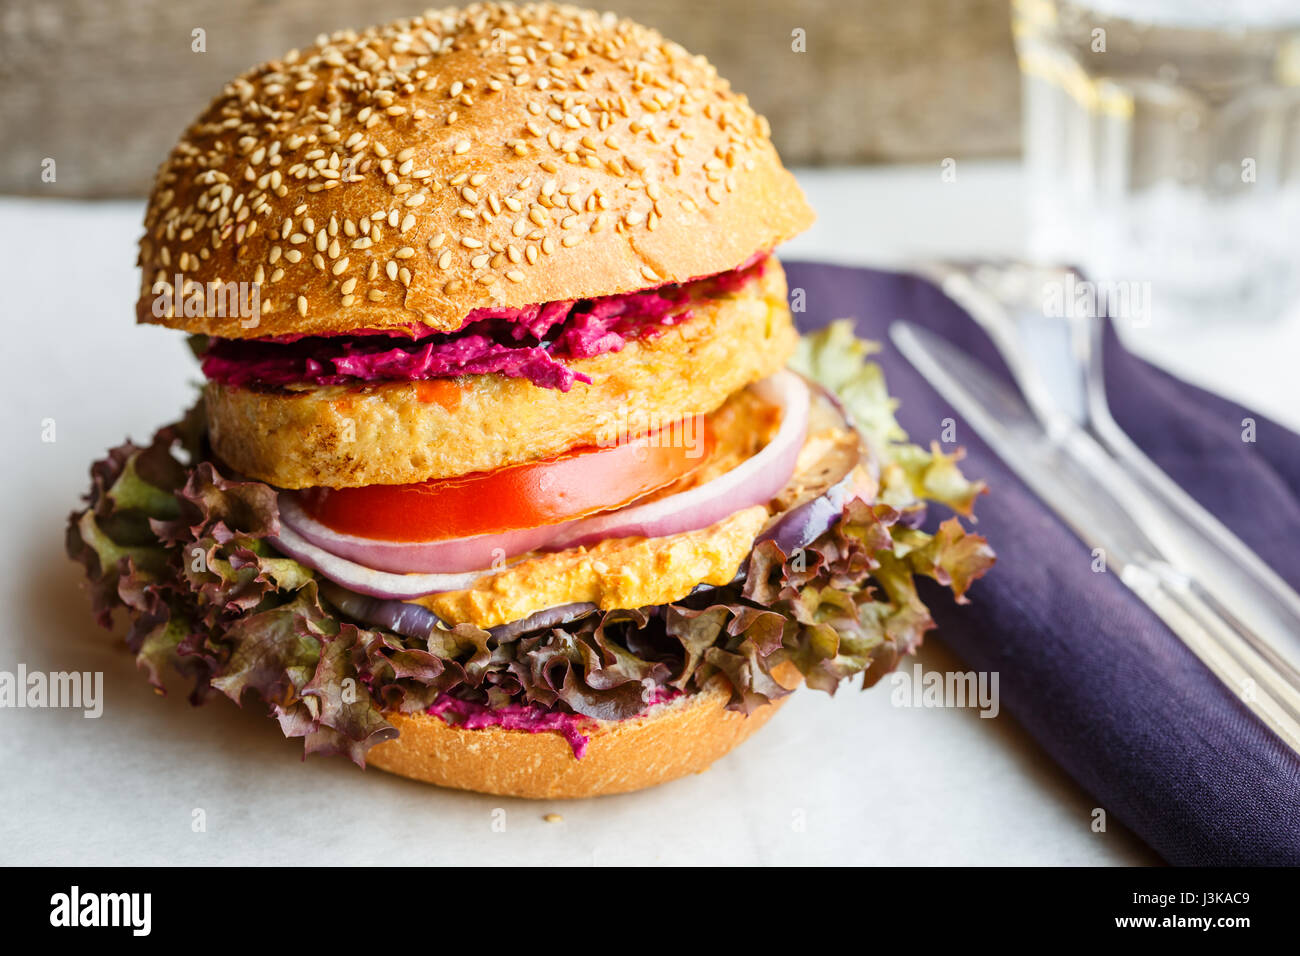 Hamburger végétarien Photo Stock